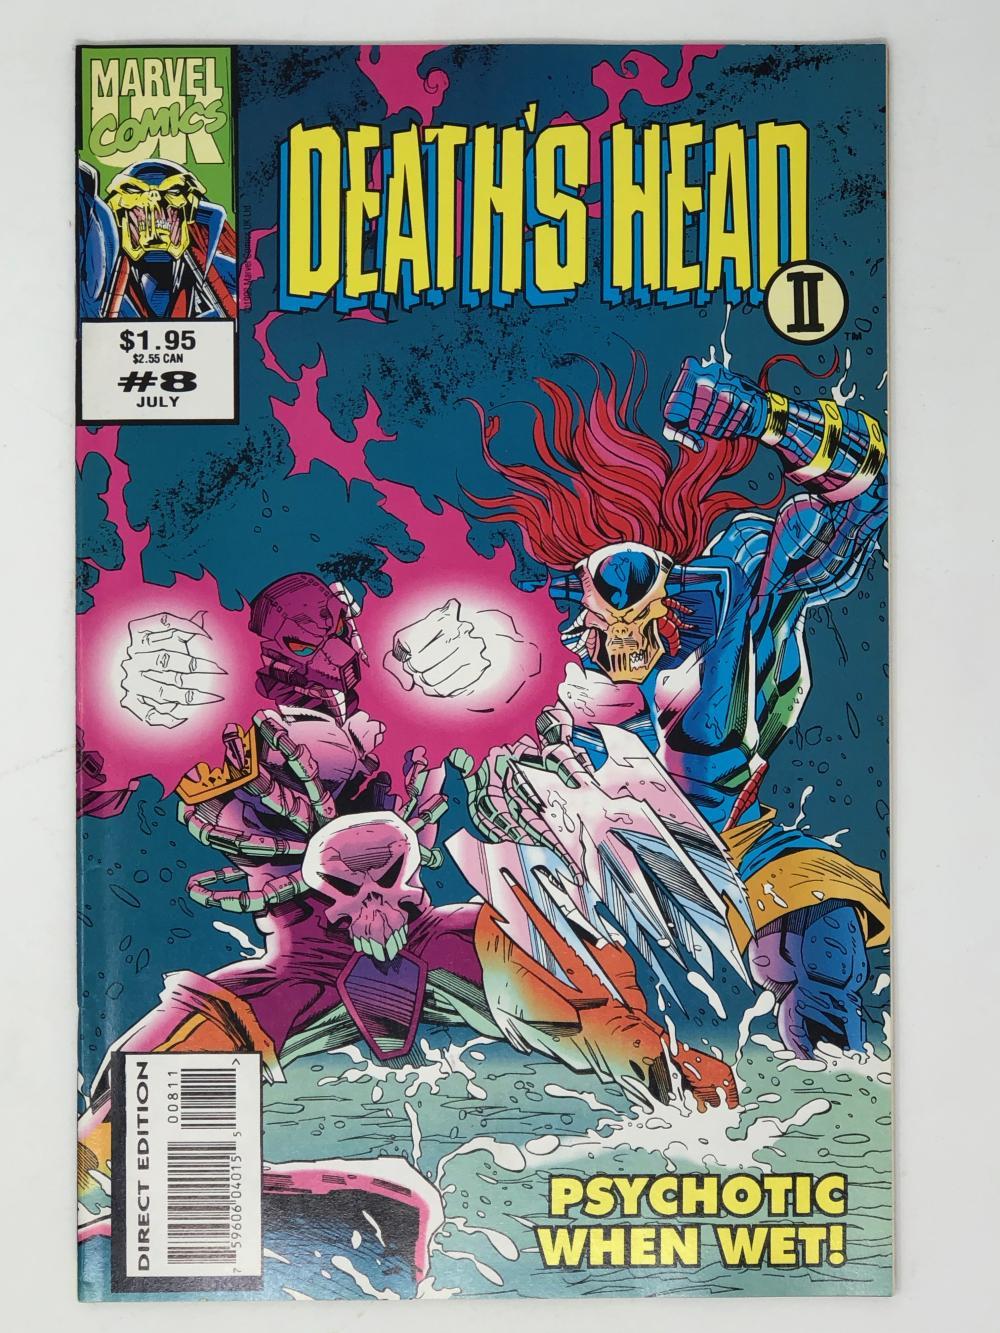 MARVEL, DEATH'S HEAD II vol 2 8